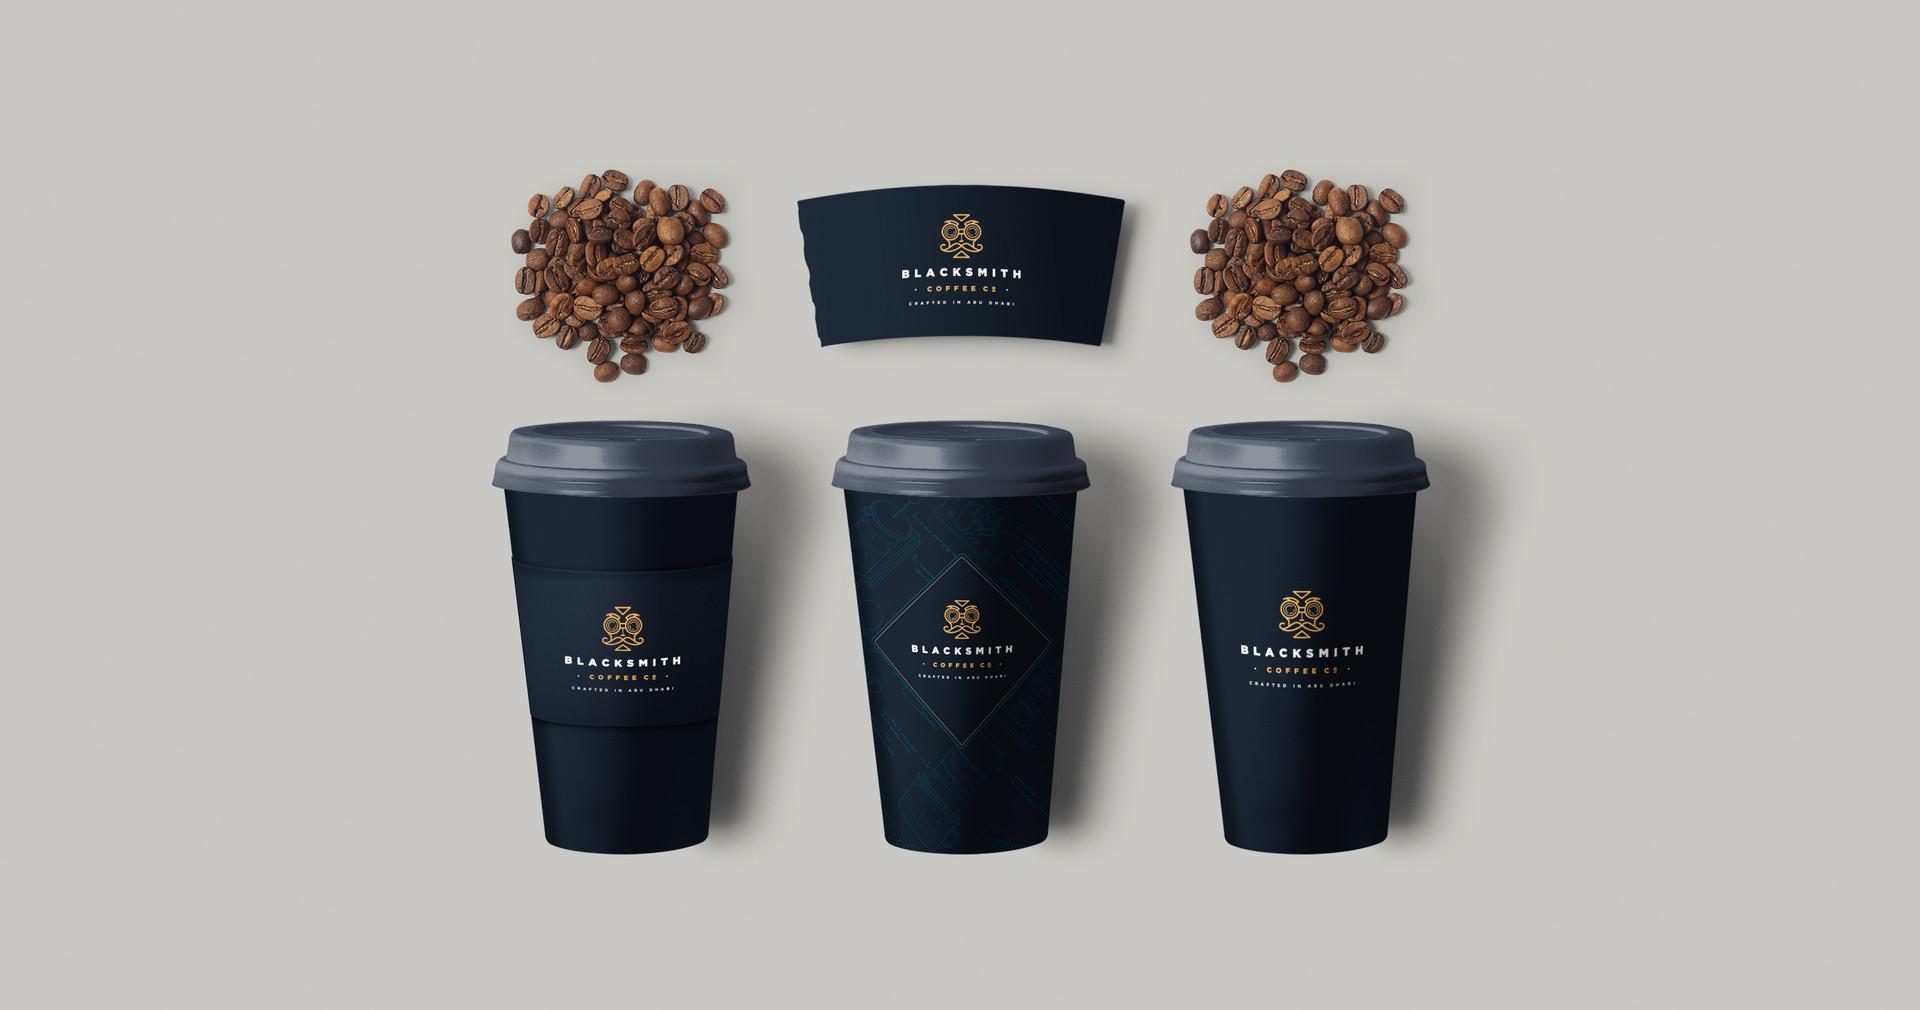 Blacksmith_Coffee Cup.jpg